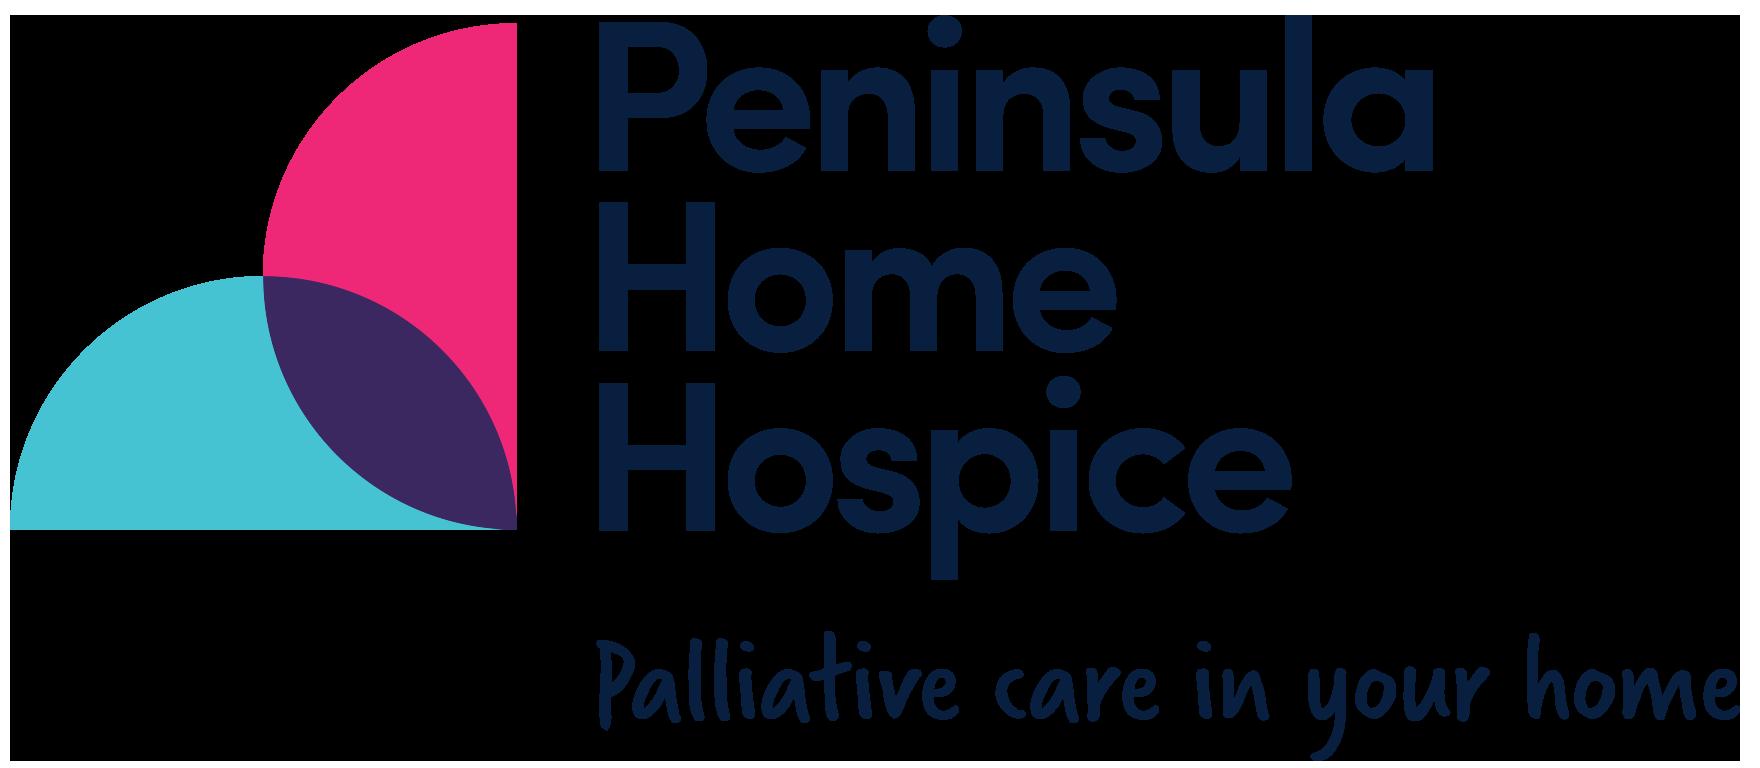 Peninsula Home Hospice Logo